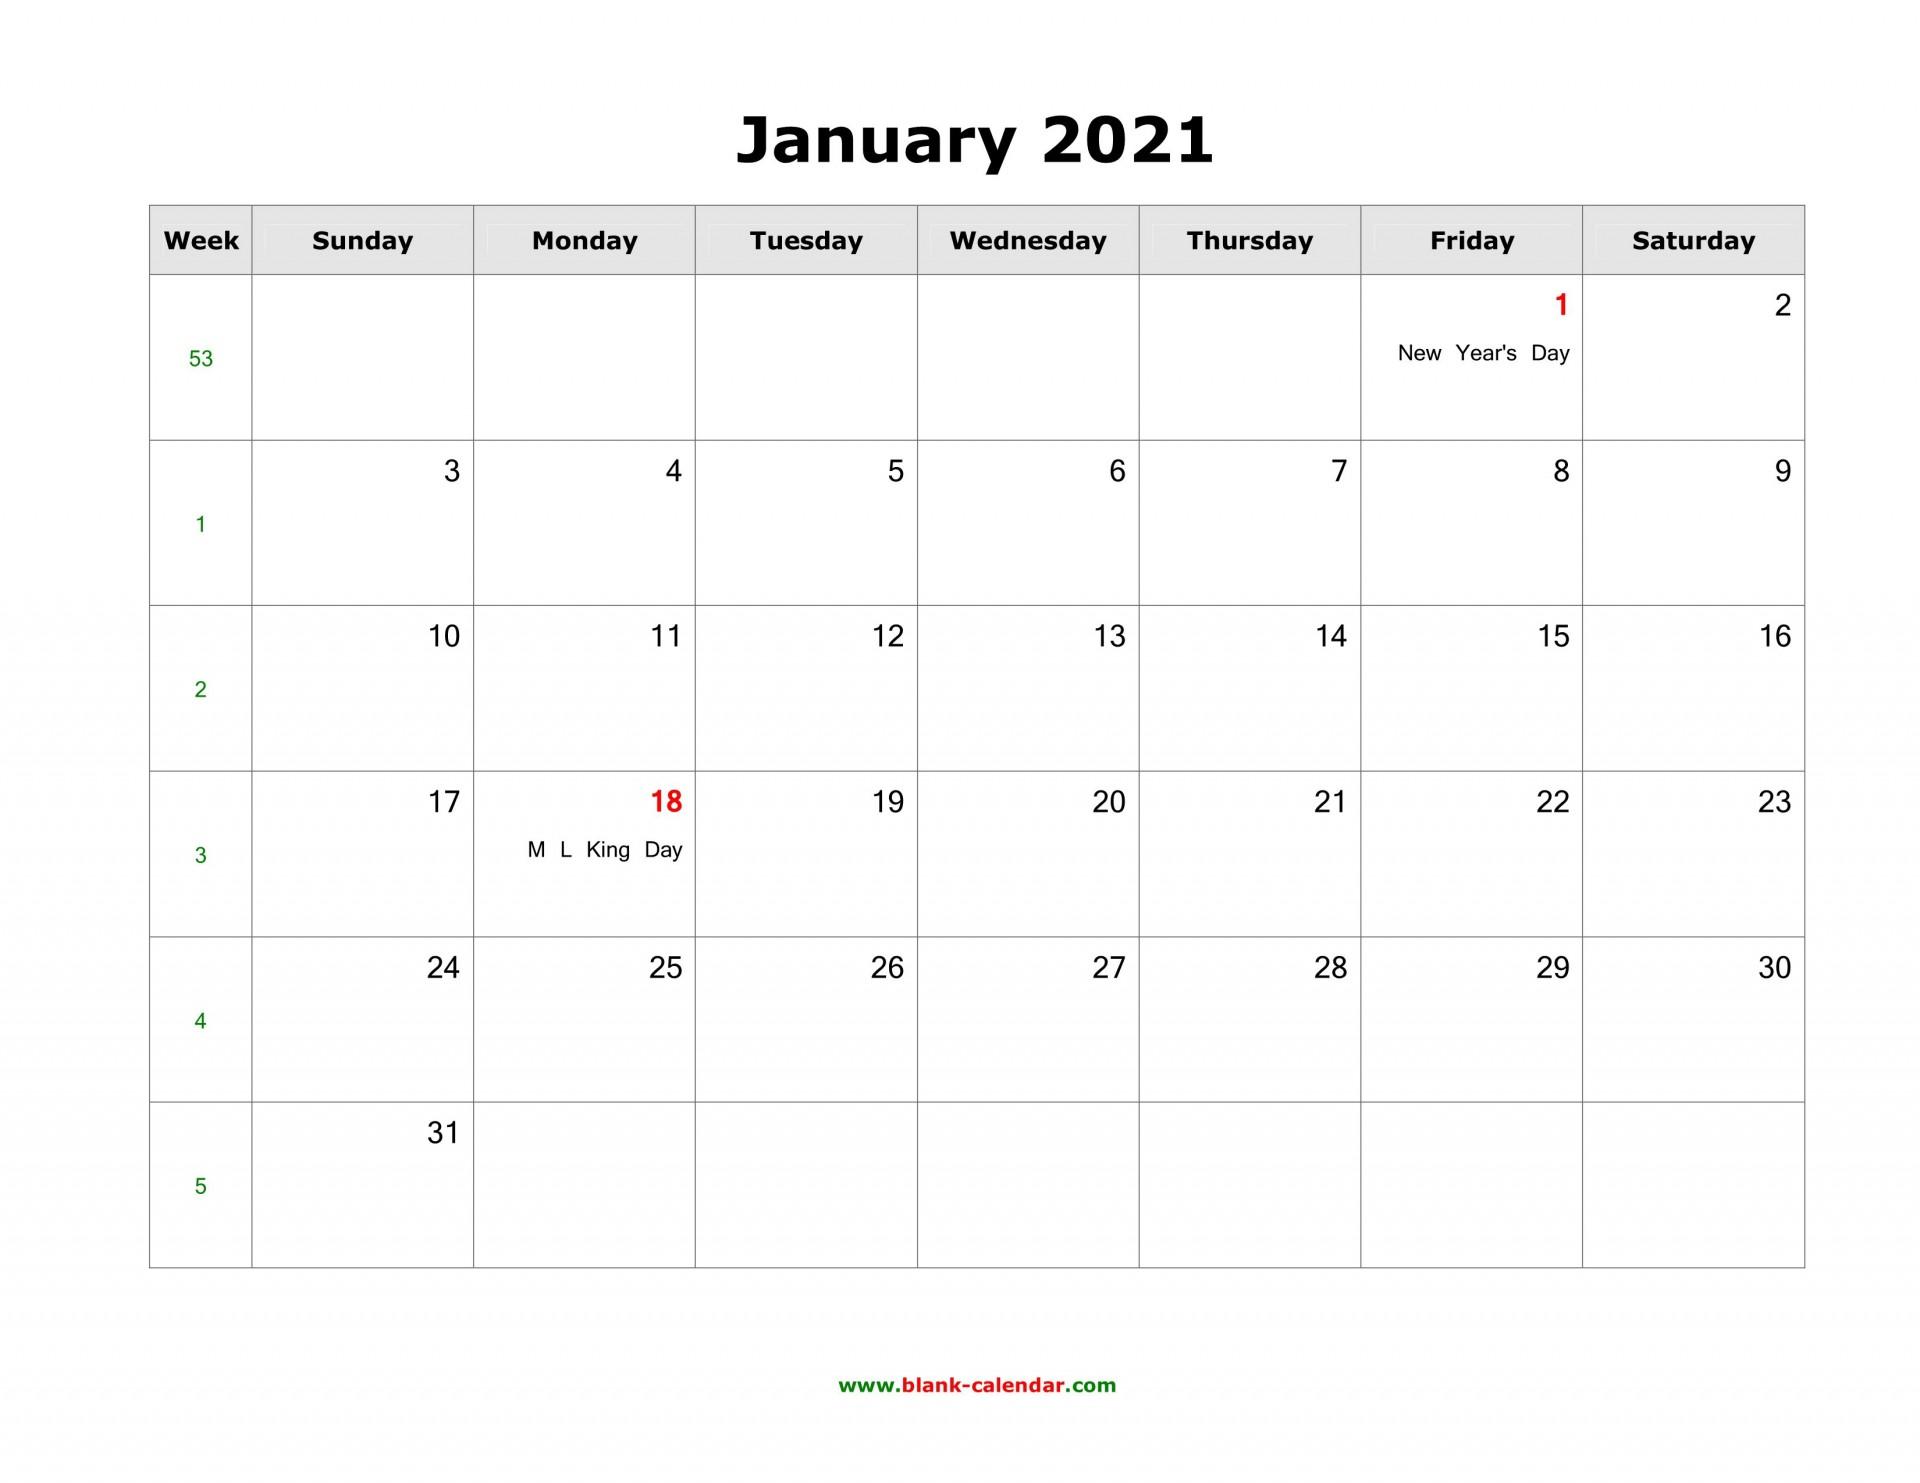 005 Unbelievable Editable Calendar Google Doc 2021 High Def 1920